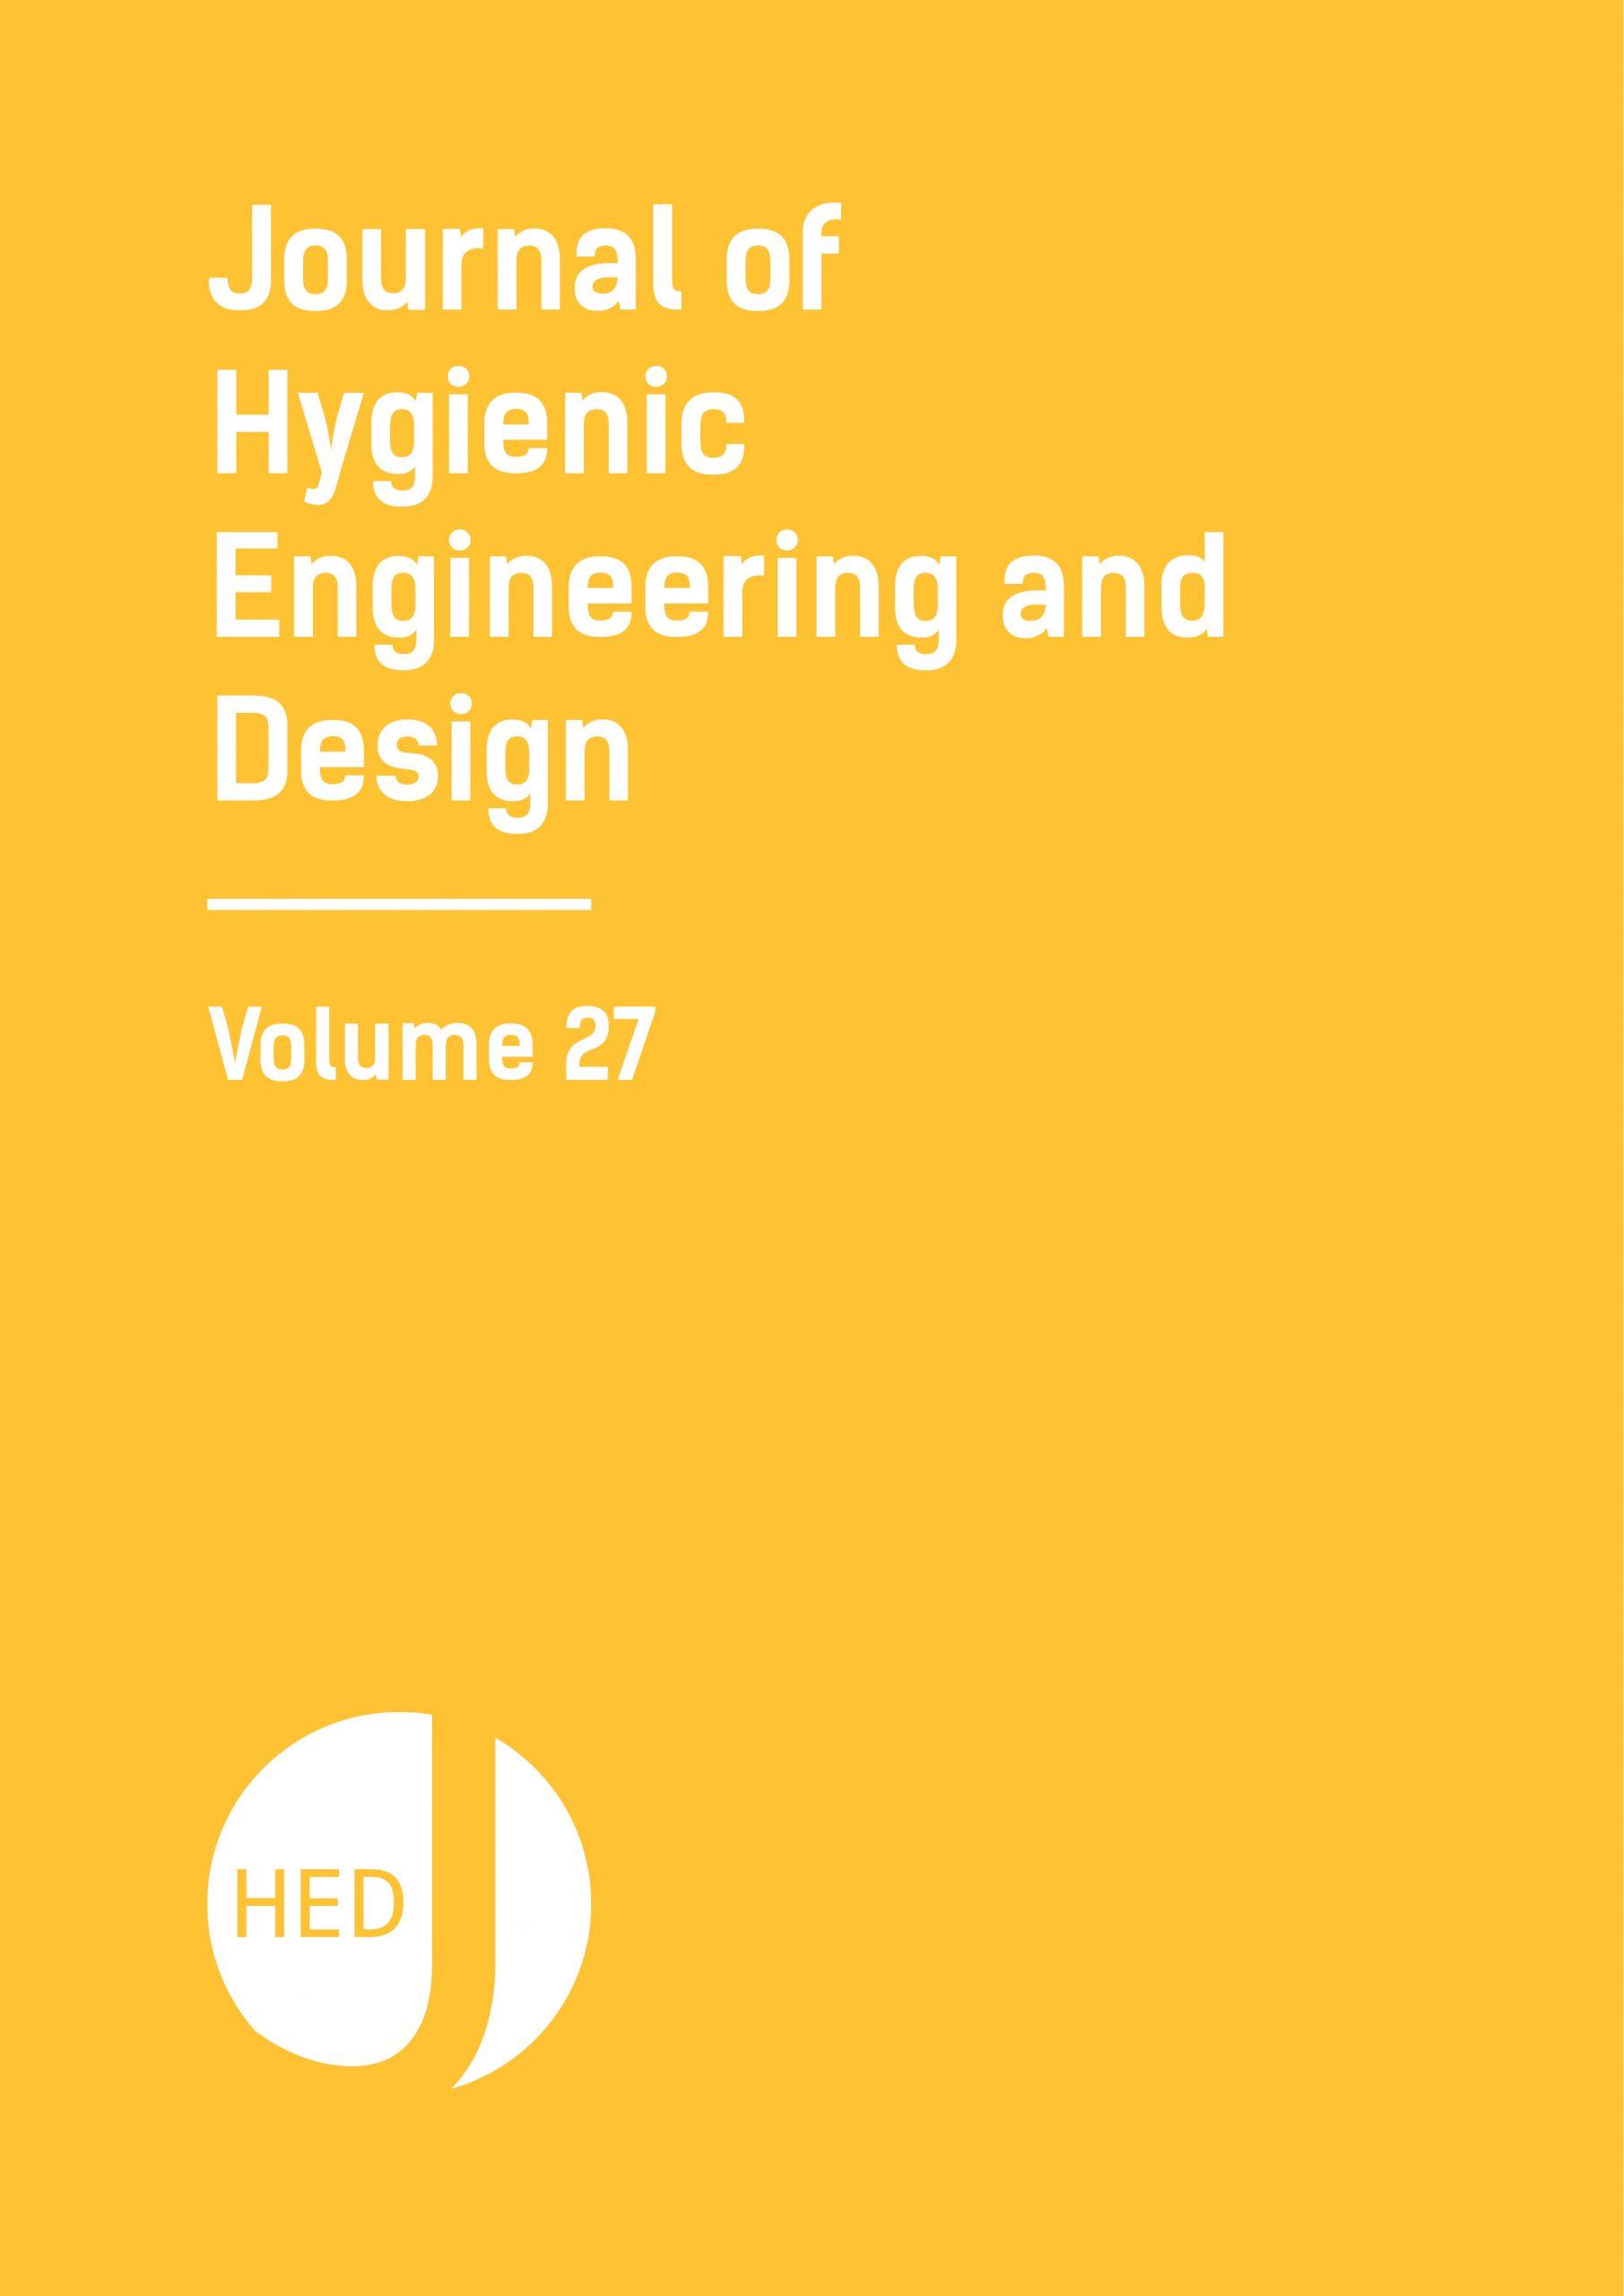 JHED Volume 27